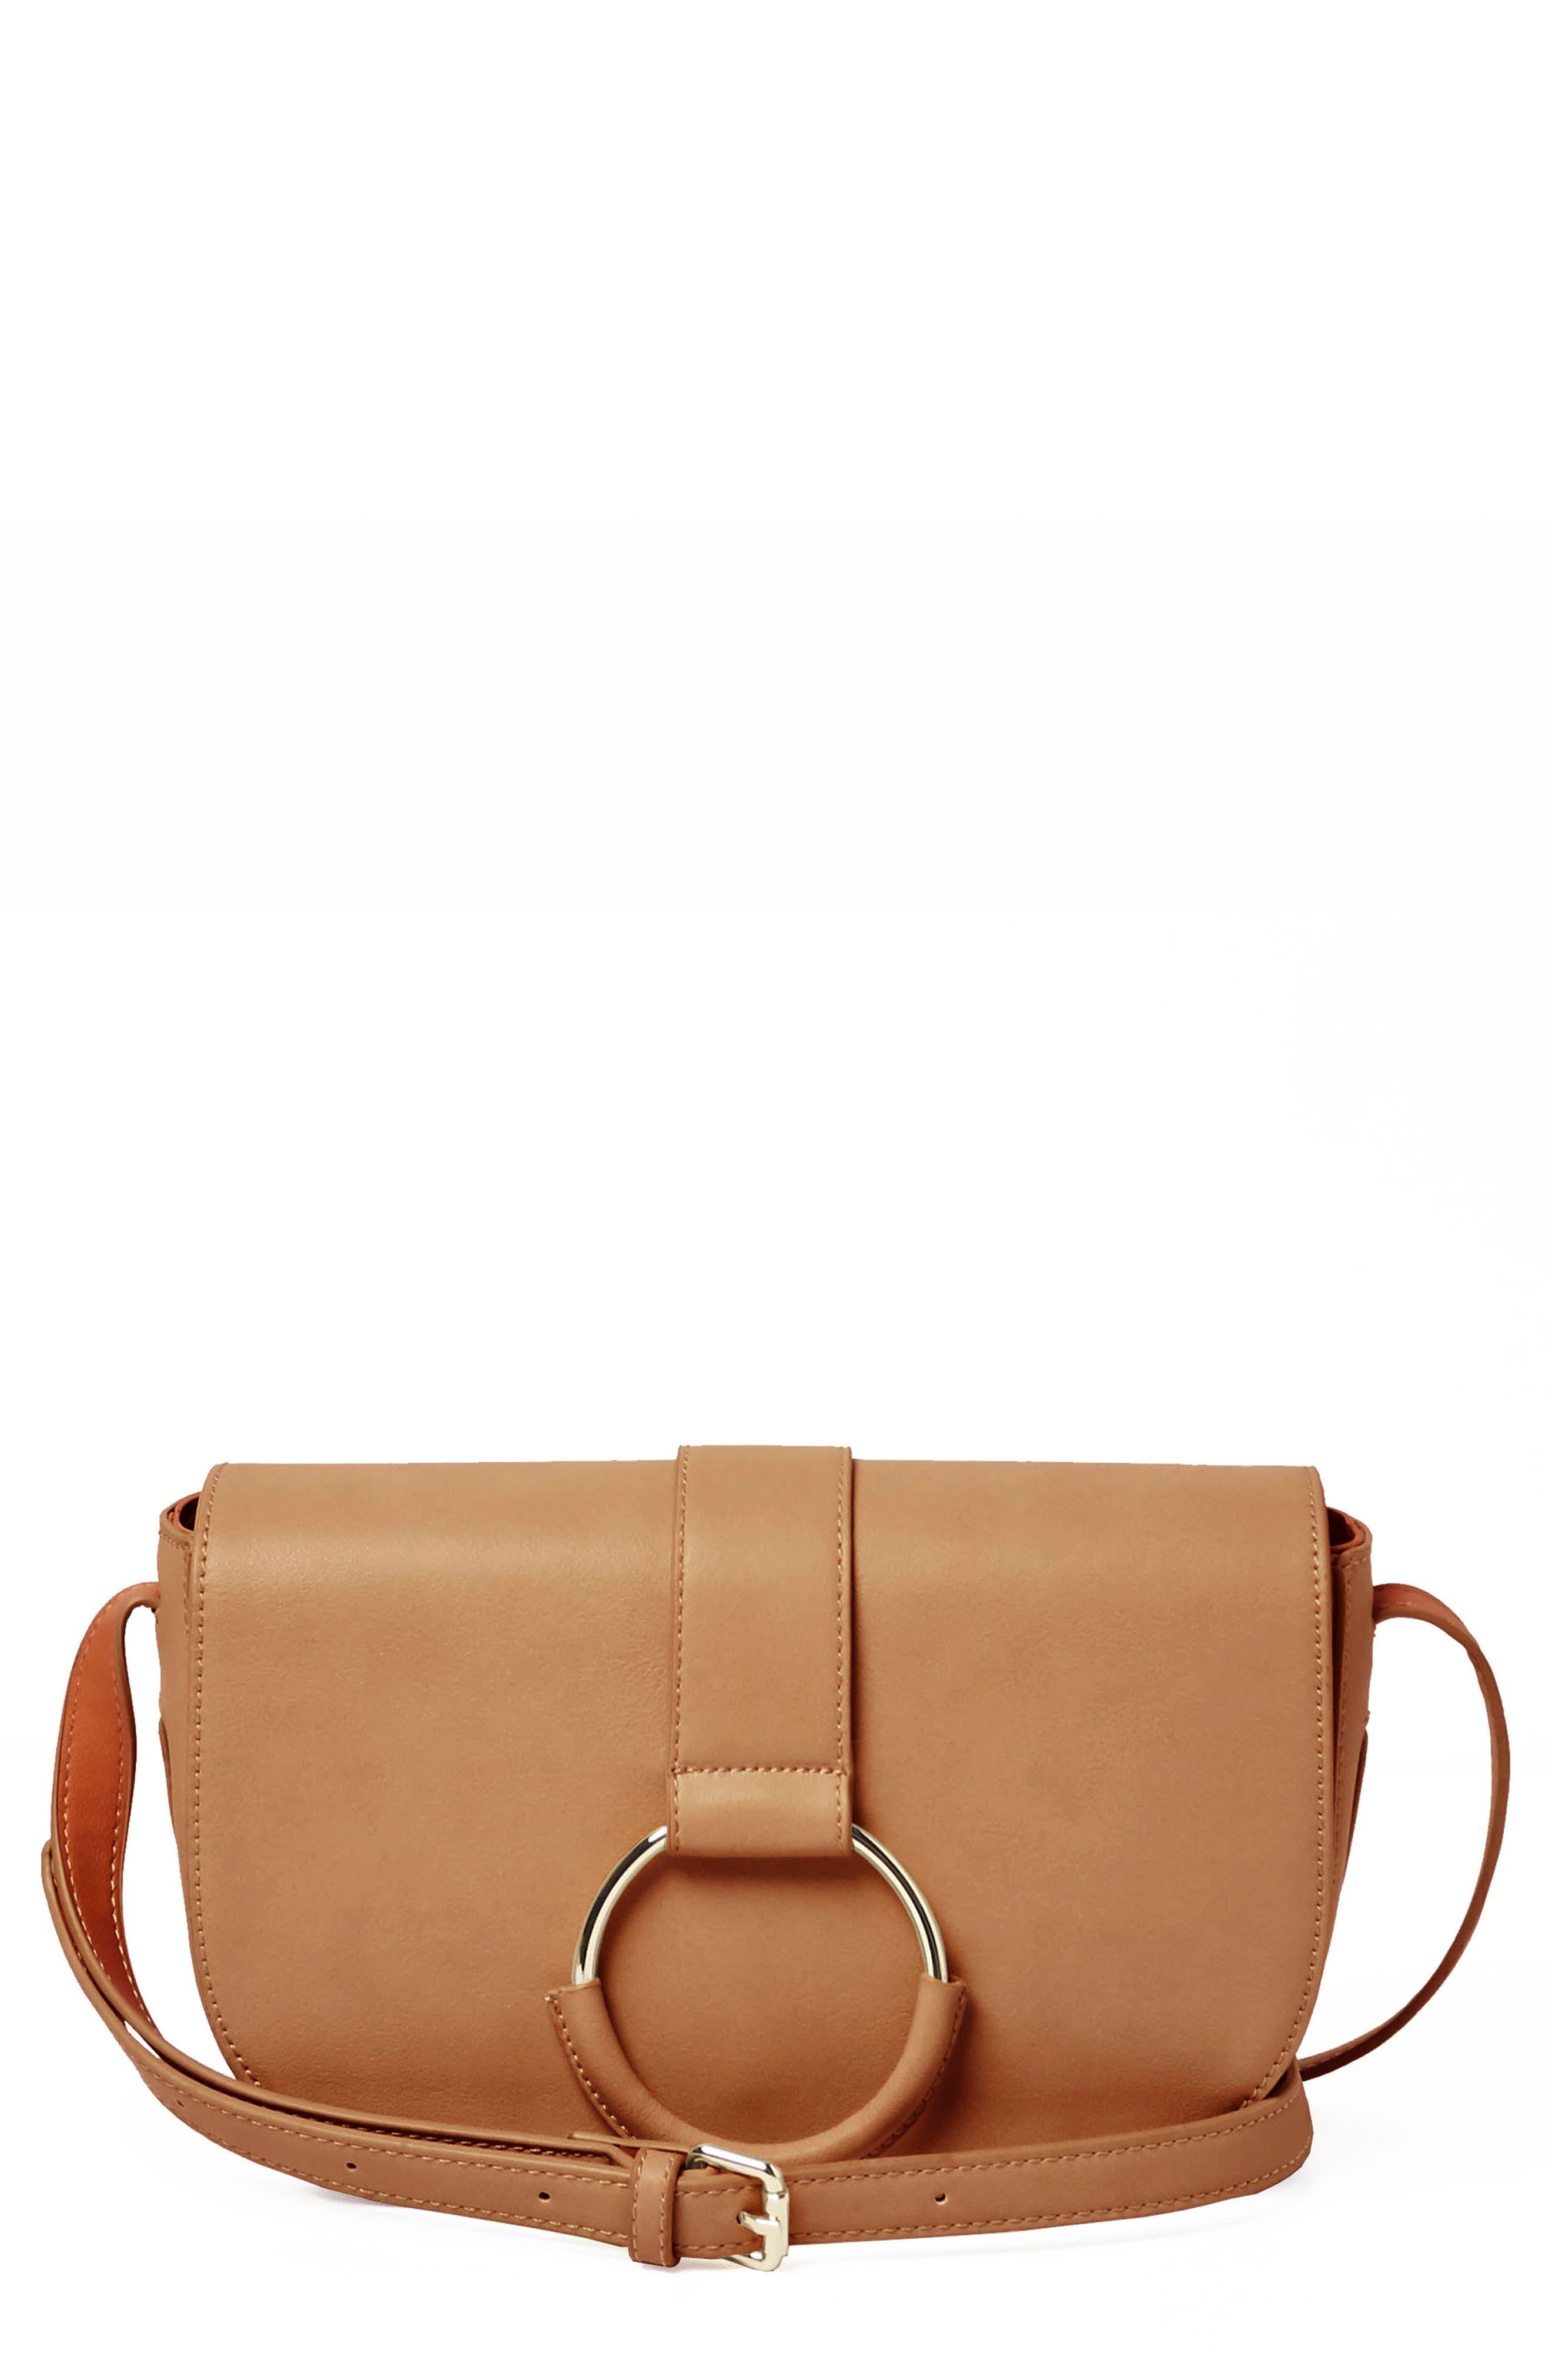 Lolita Vegan Leather Crossbody Bag,                         Main,                         color, CAMEL